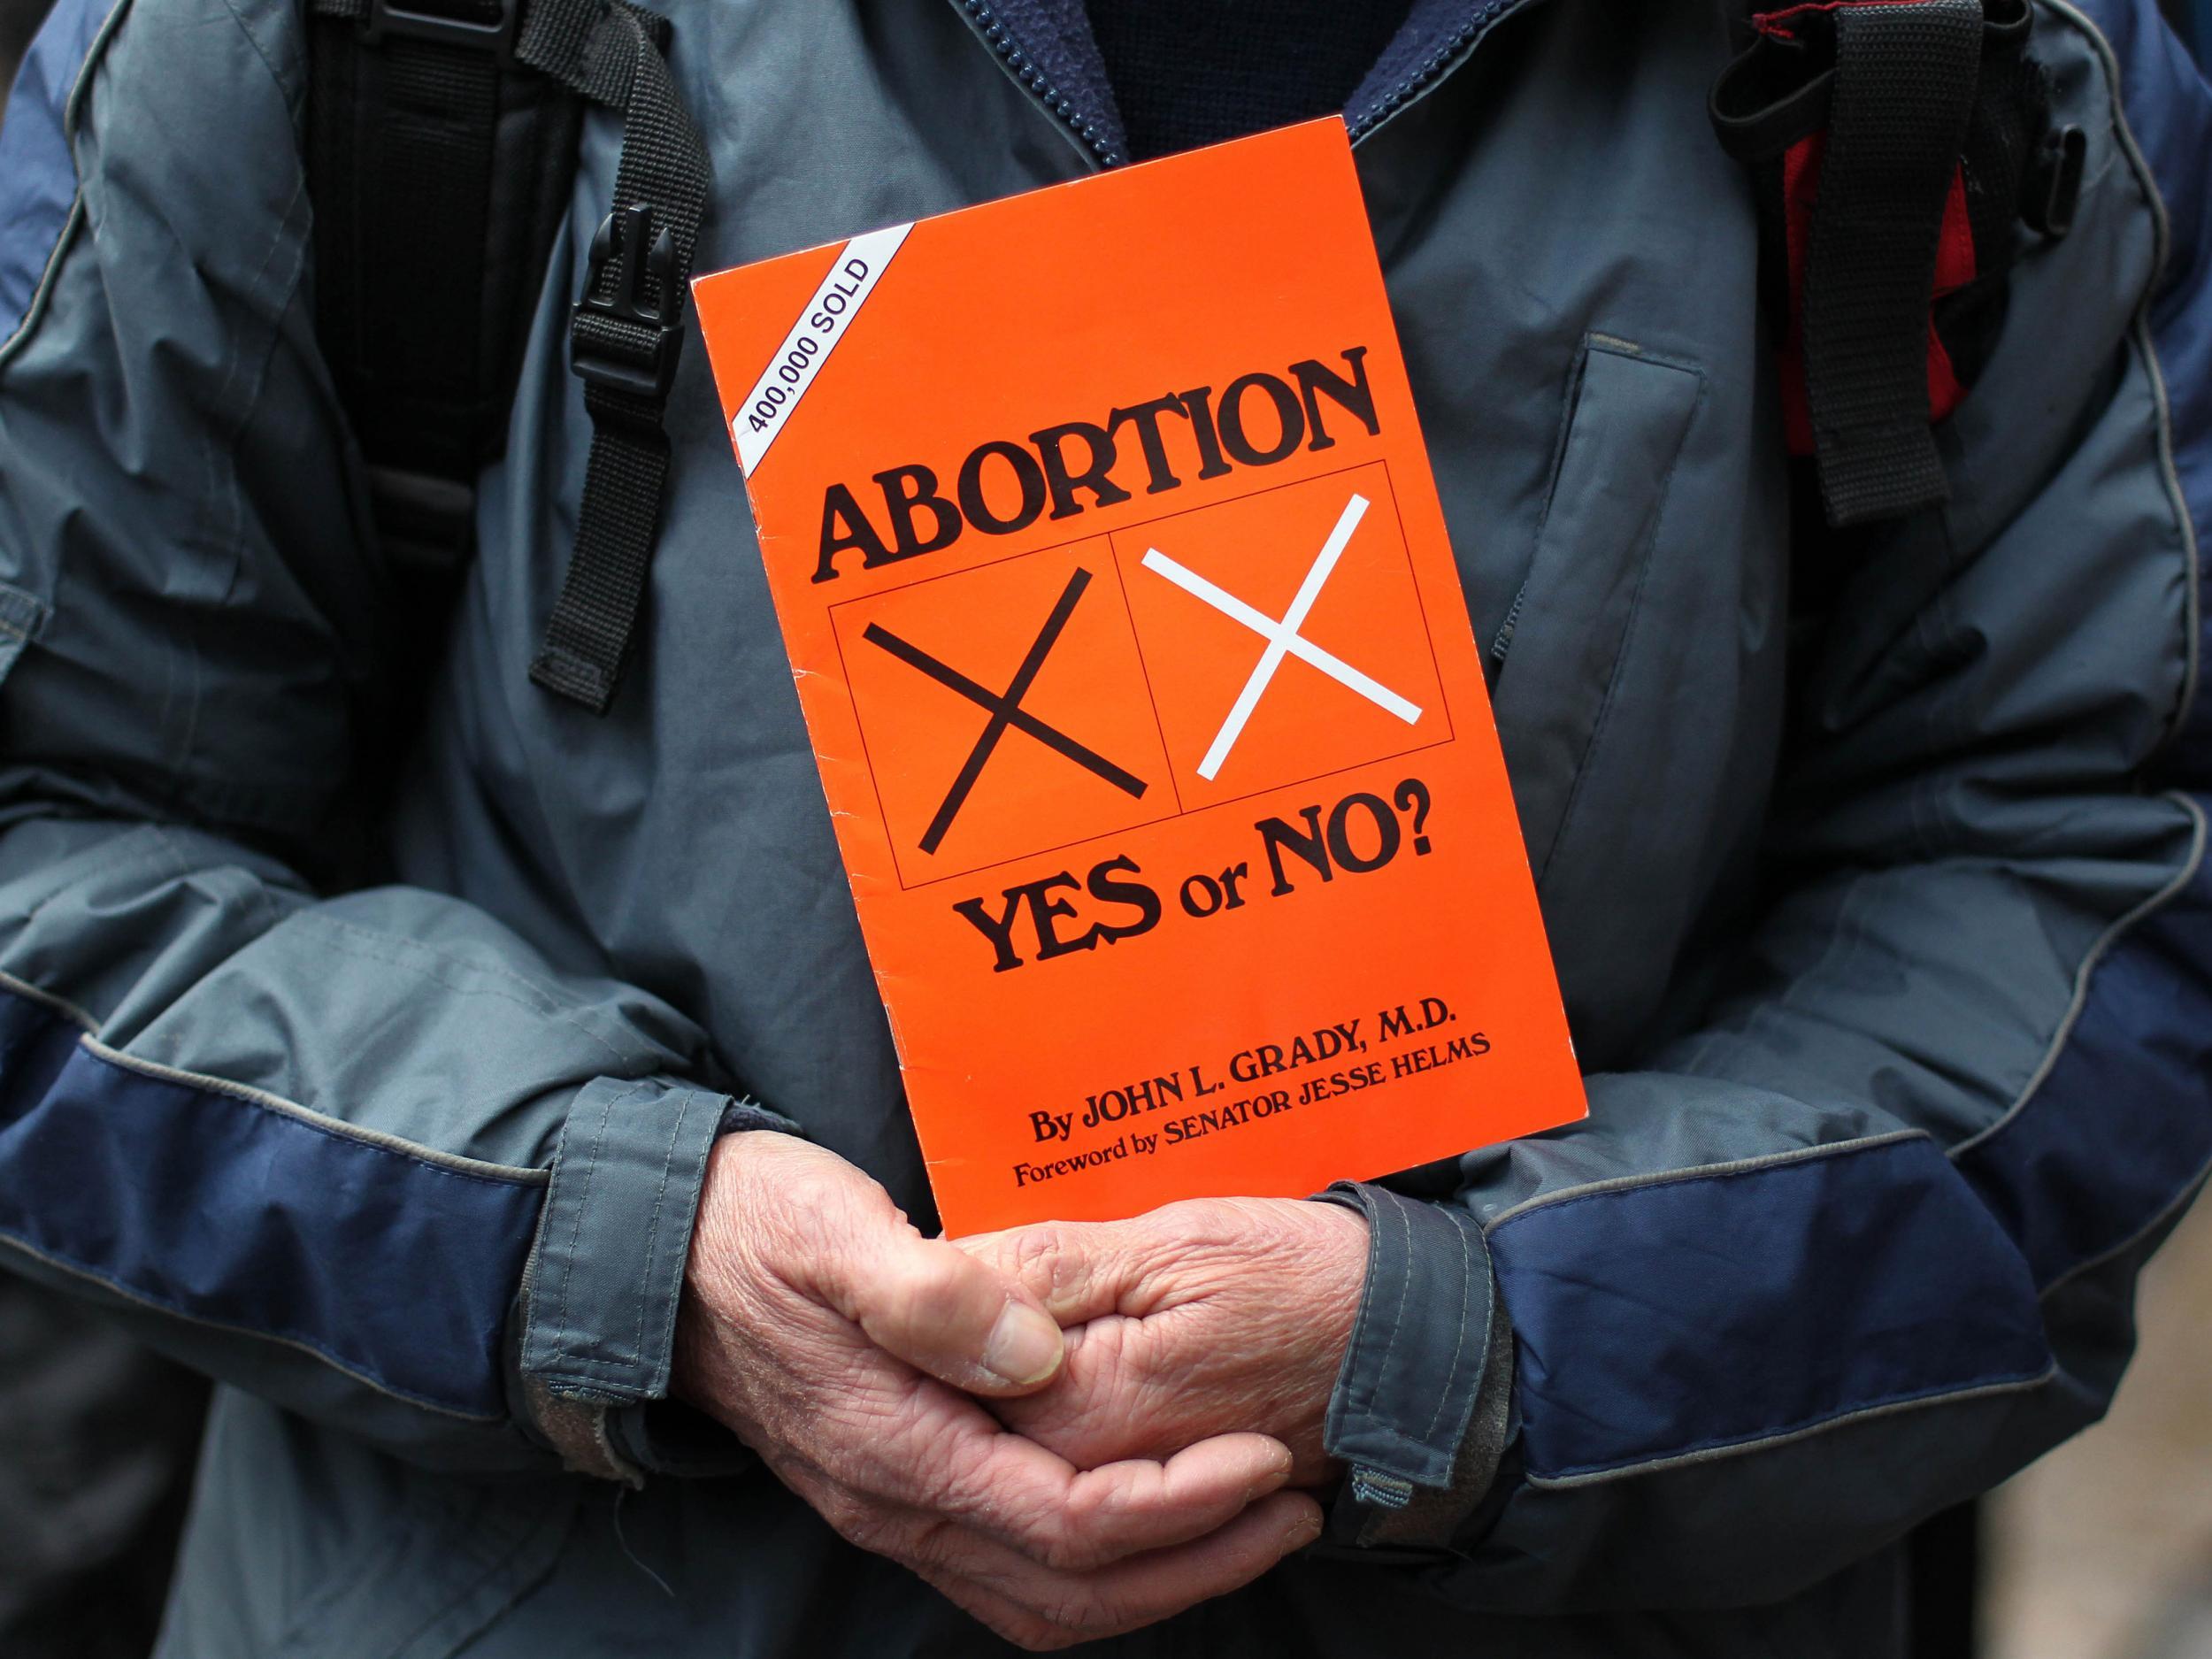 Vast majority of Northern Irish people back reform of 'inhumane' abortion law, survey finds